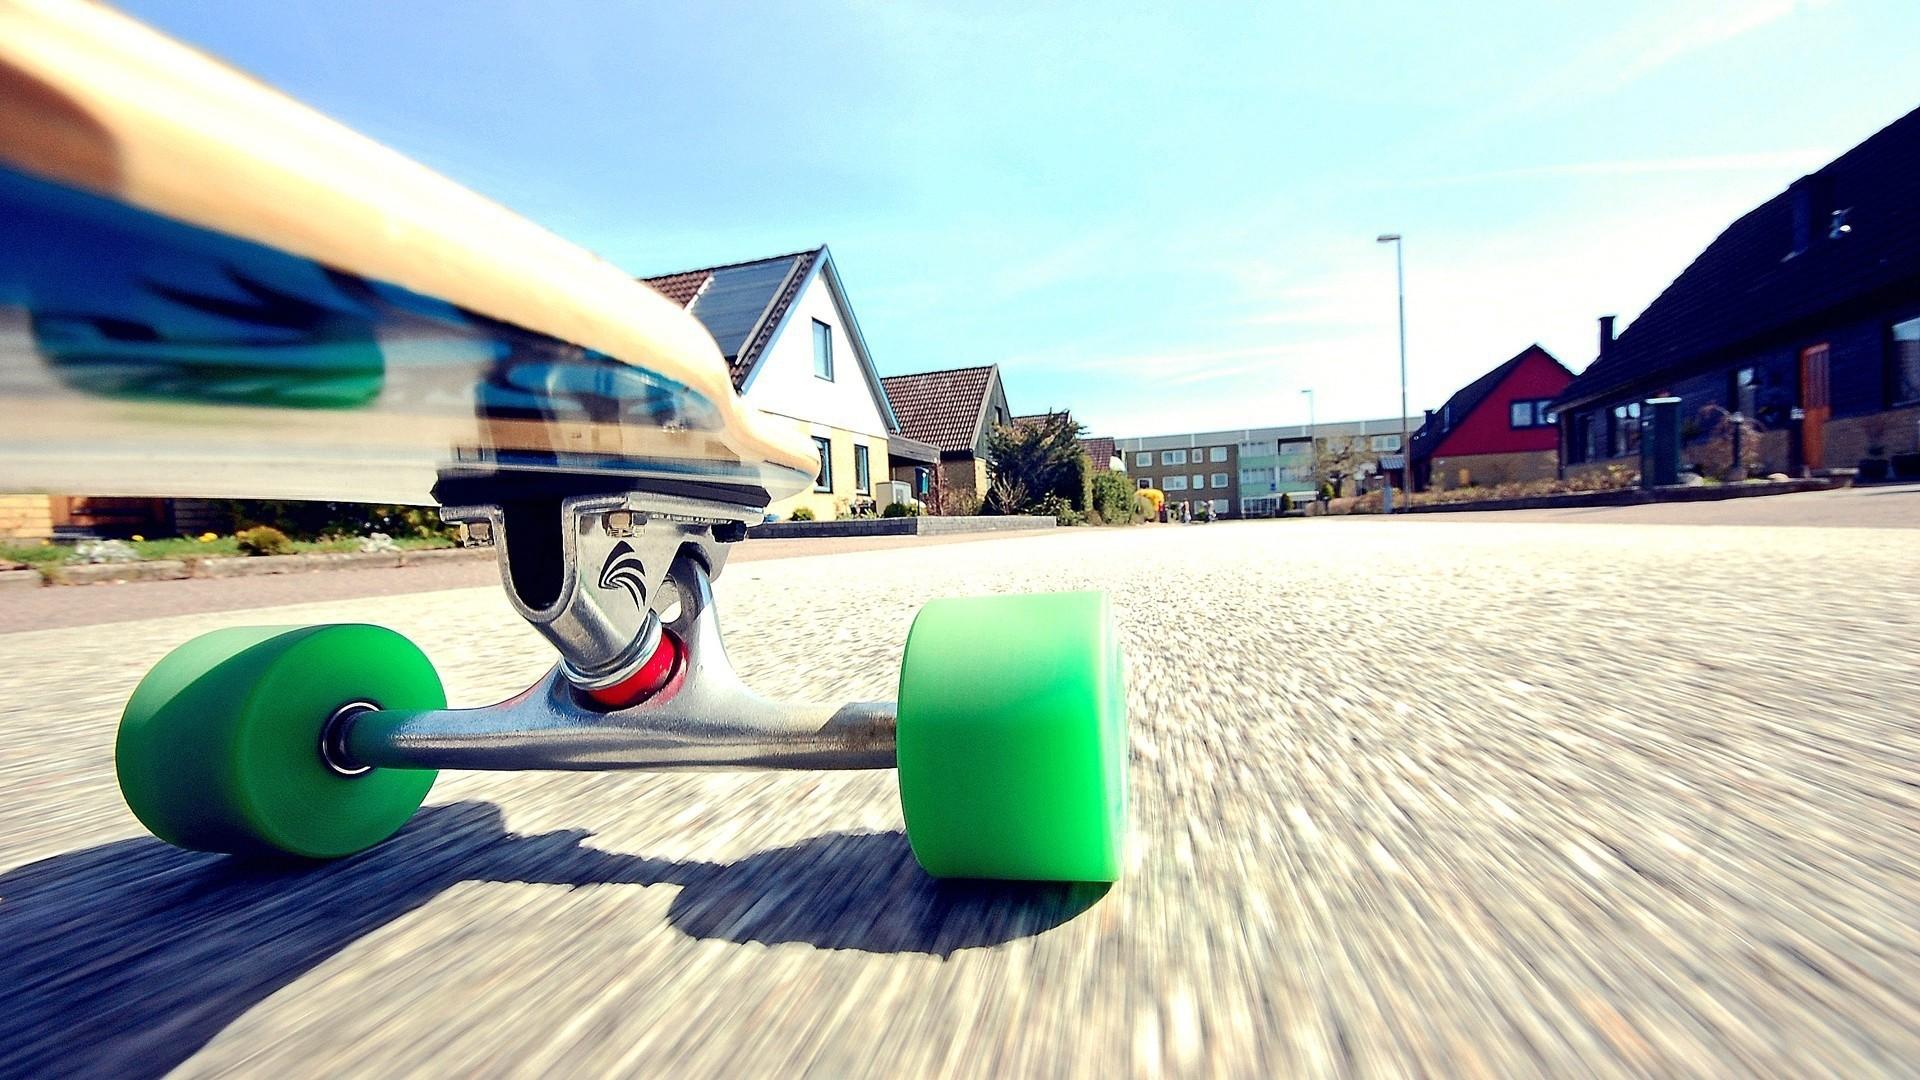 Skateboard High Quality